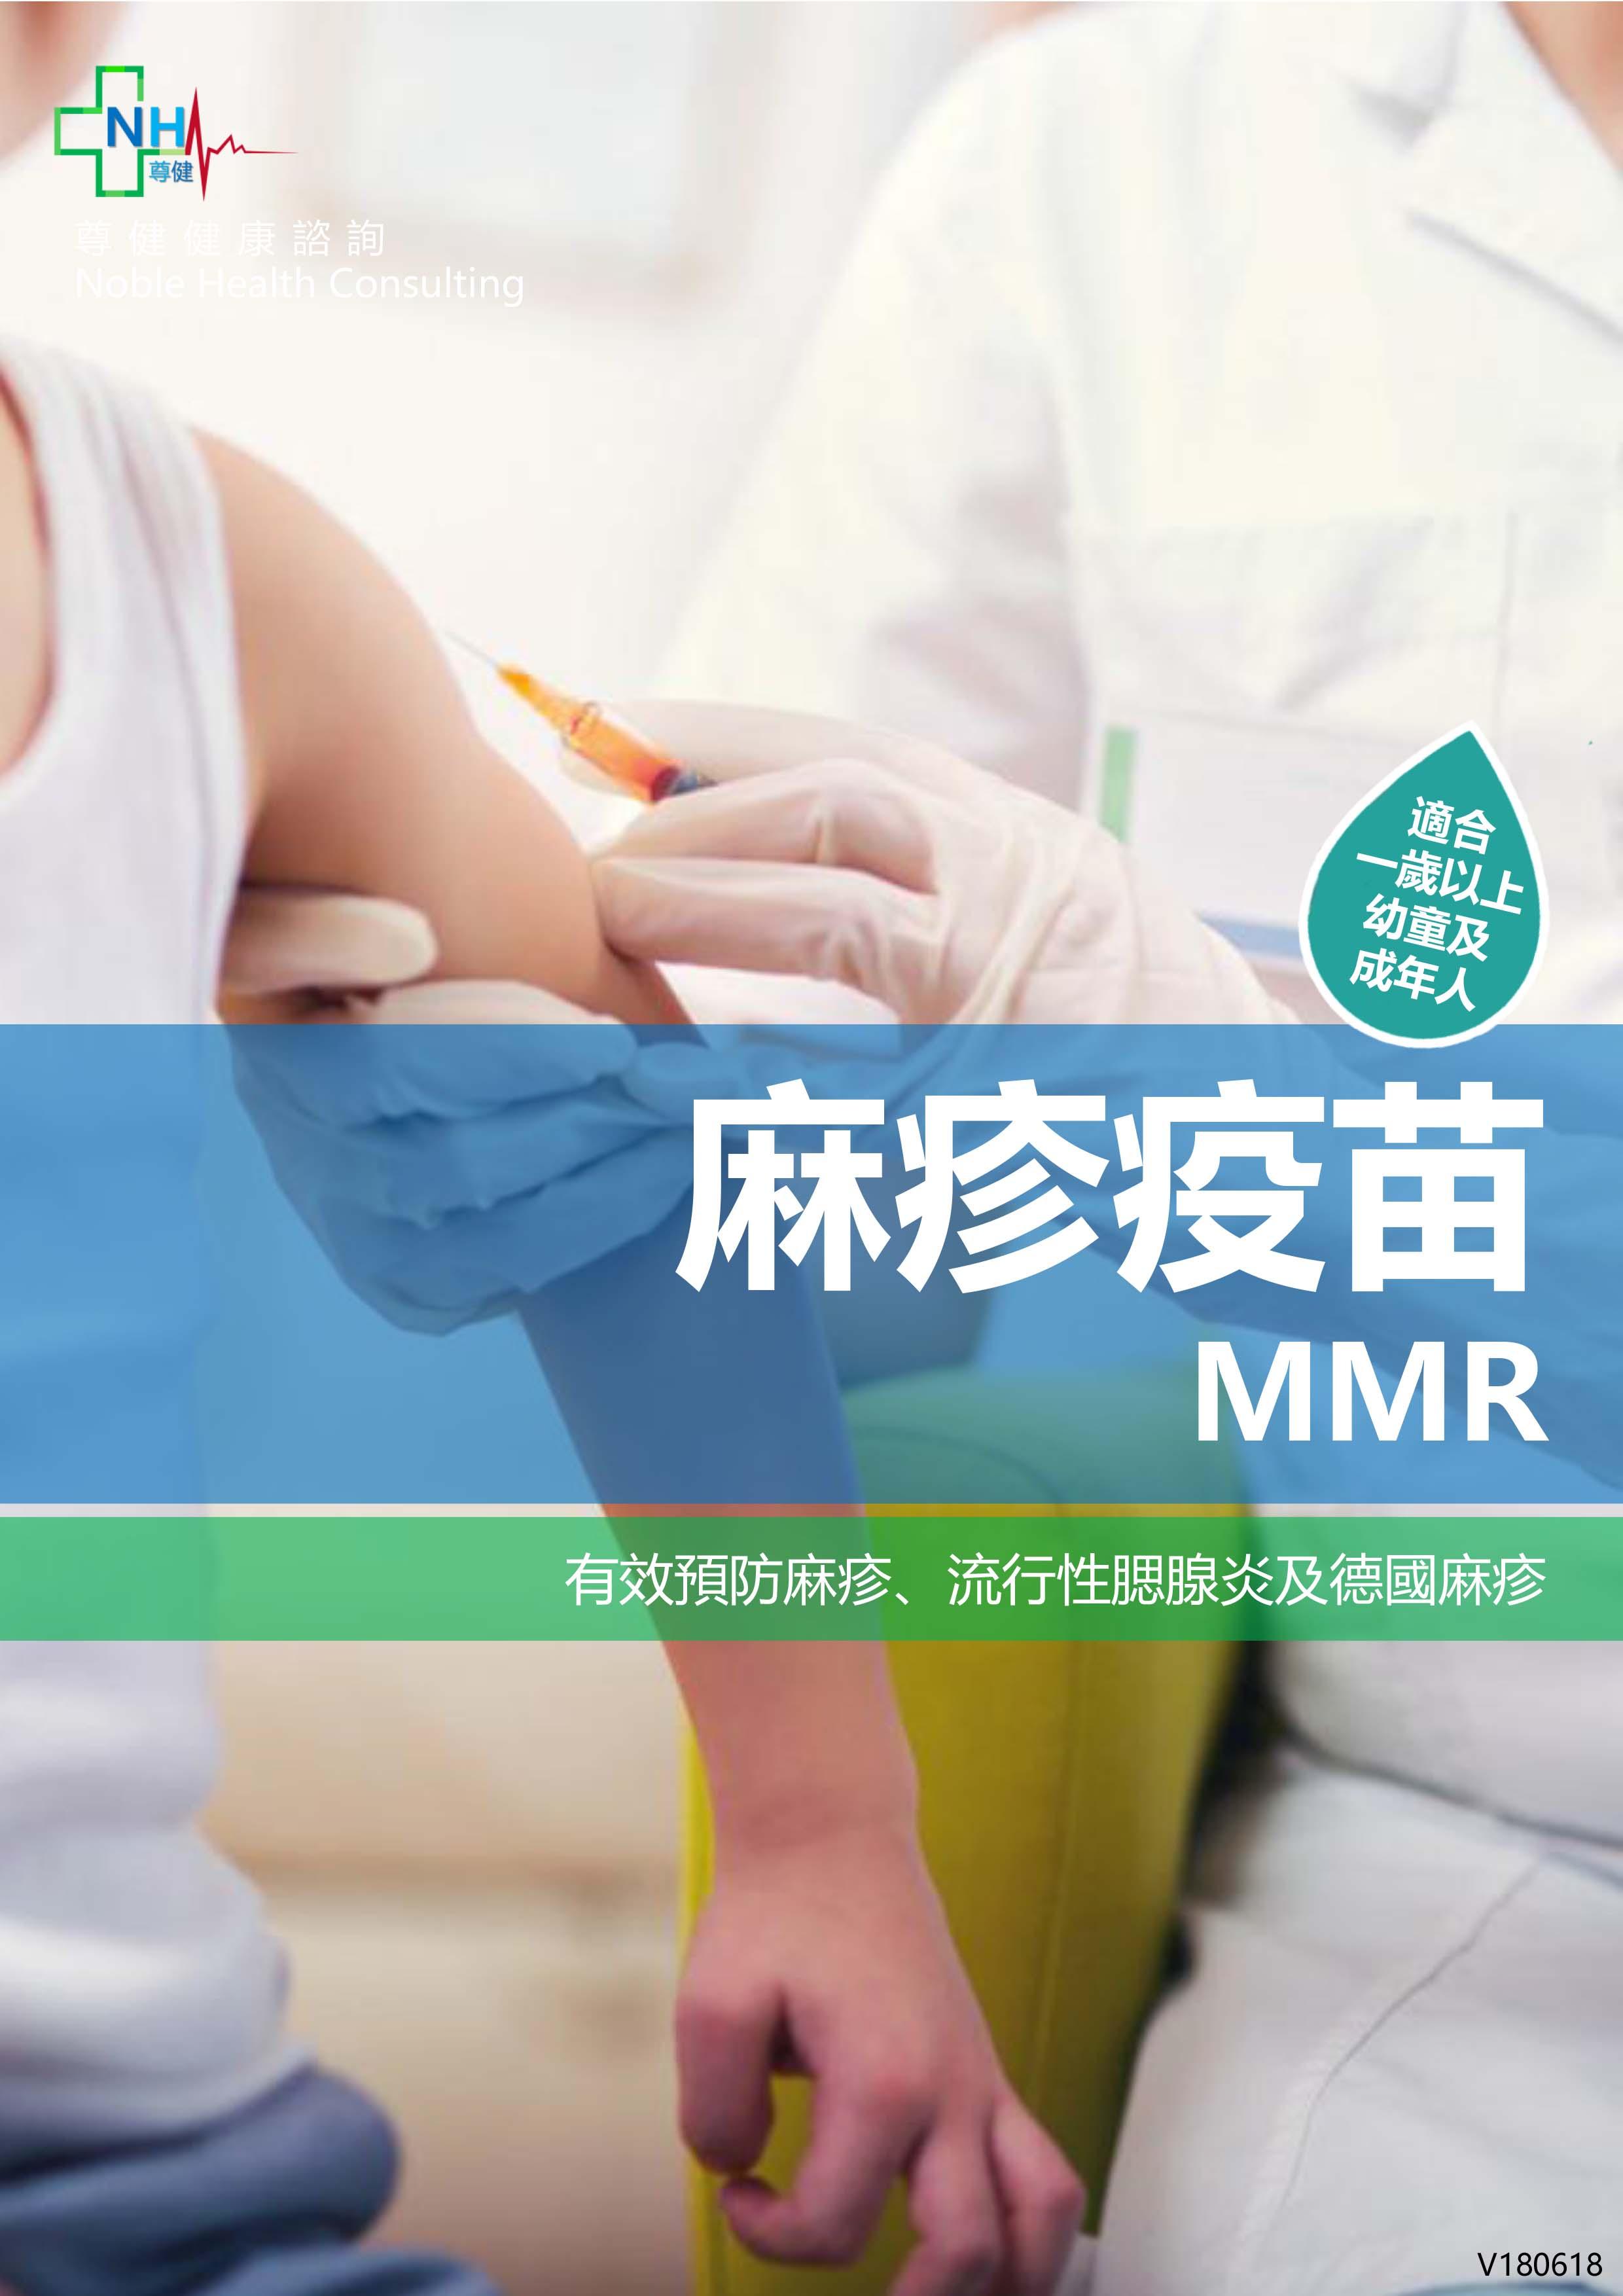 3a-measles-vaccine-1.jpg